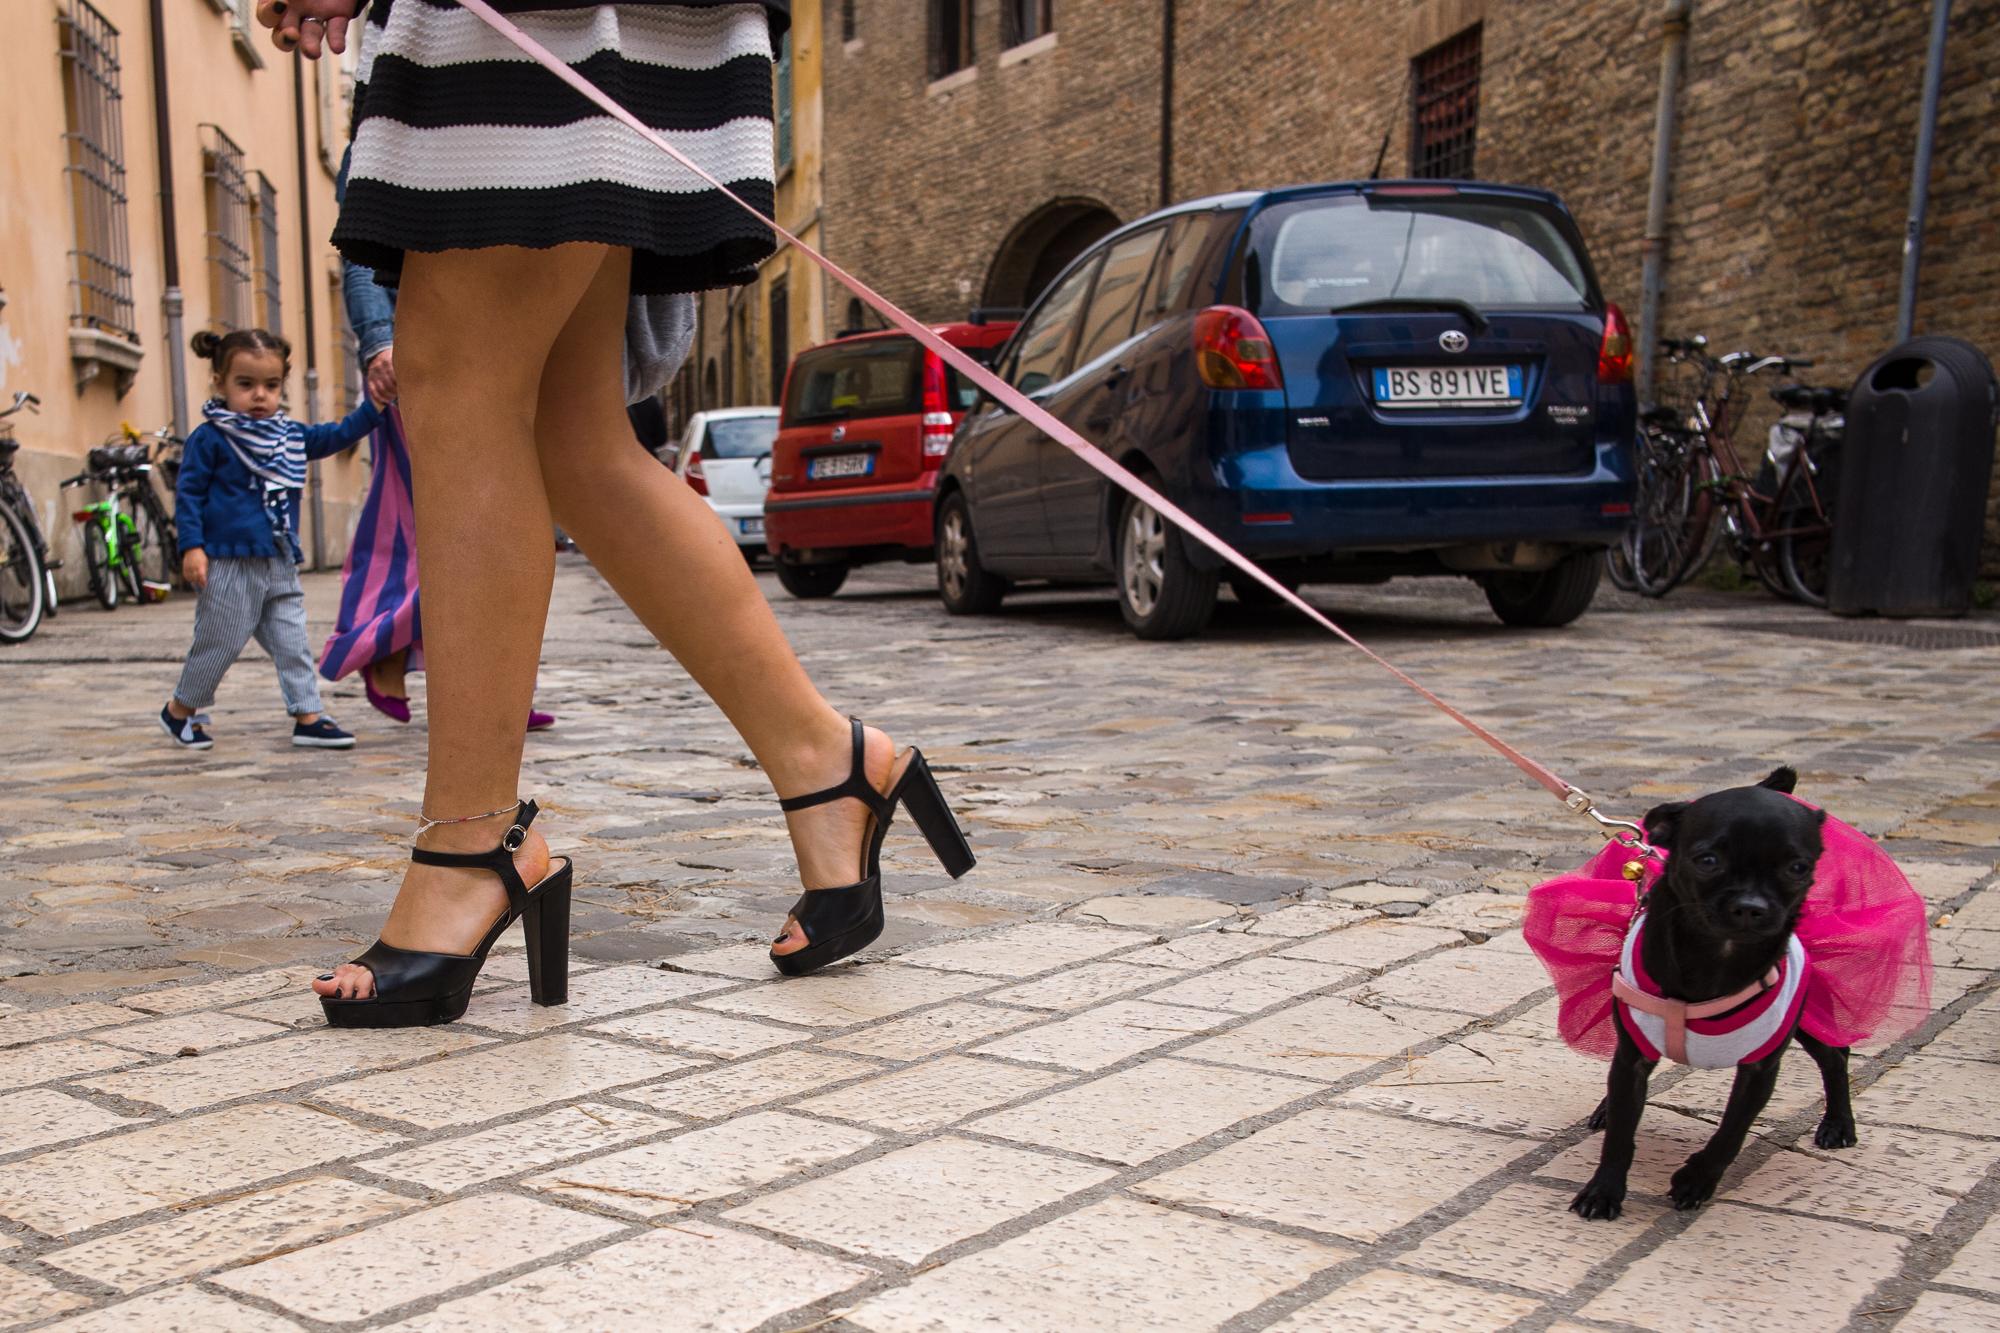 On the streets of Ravenna